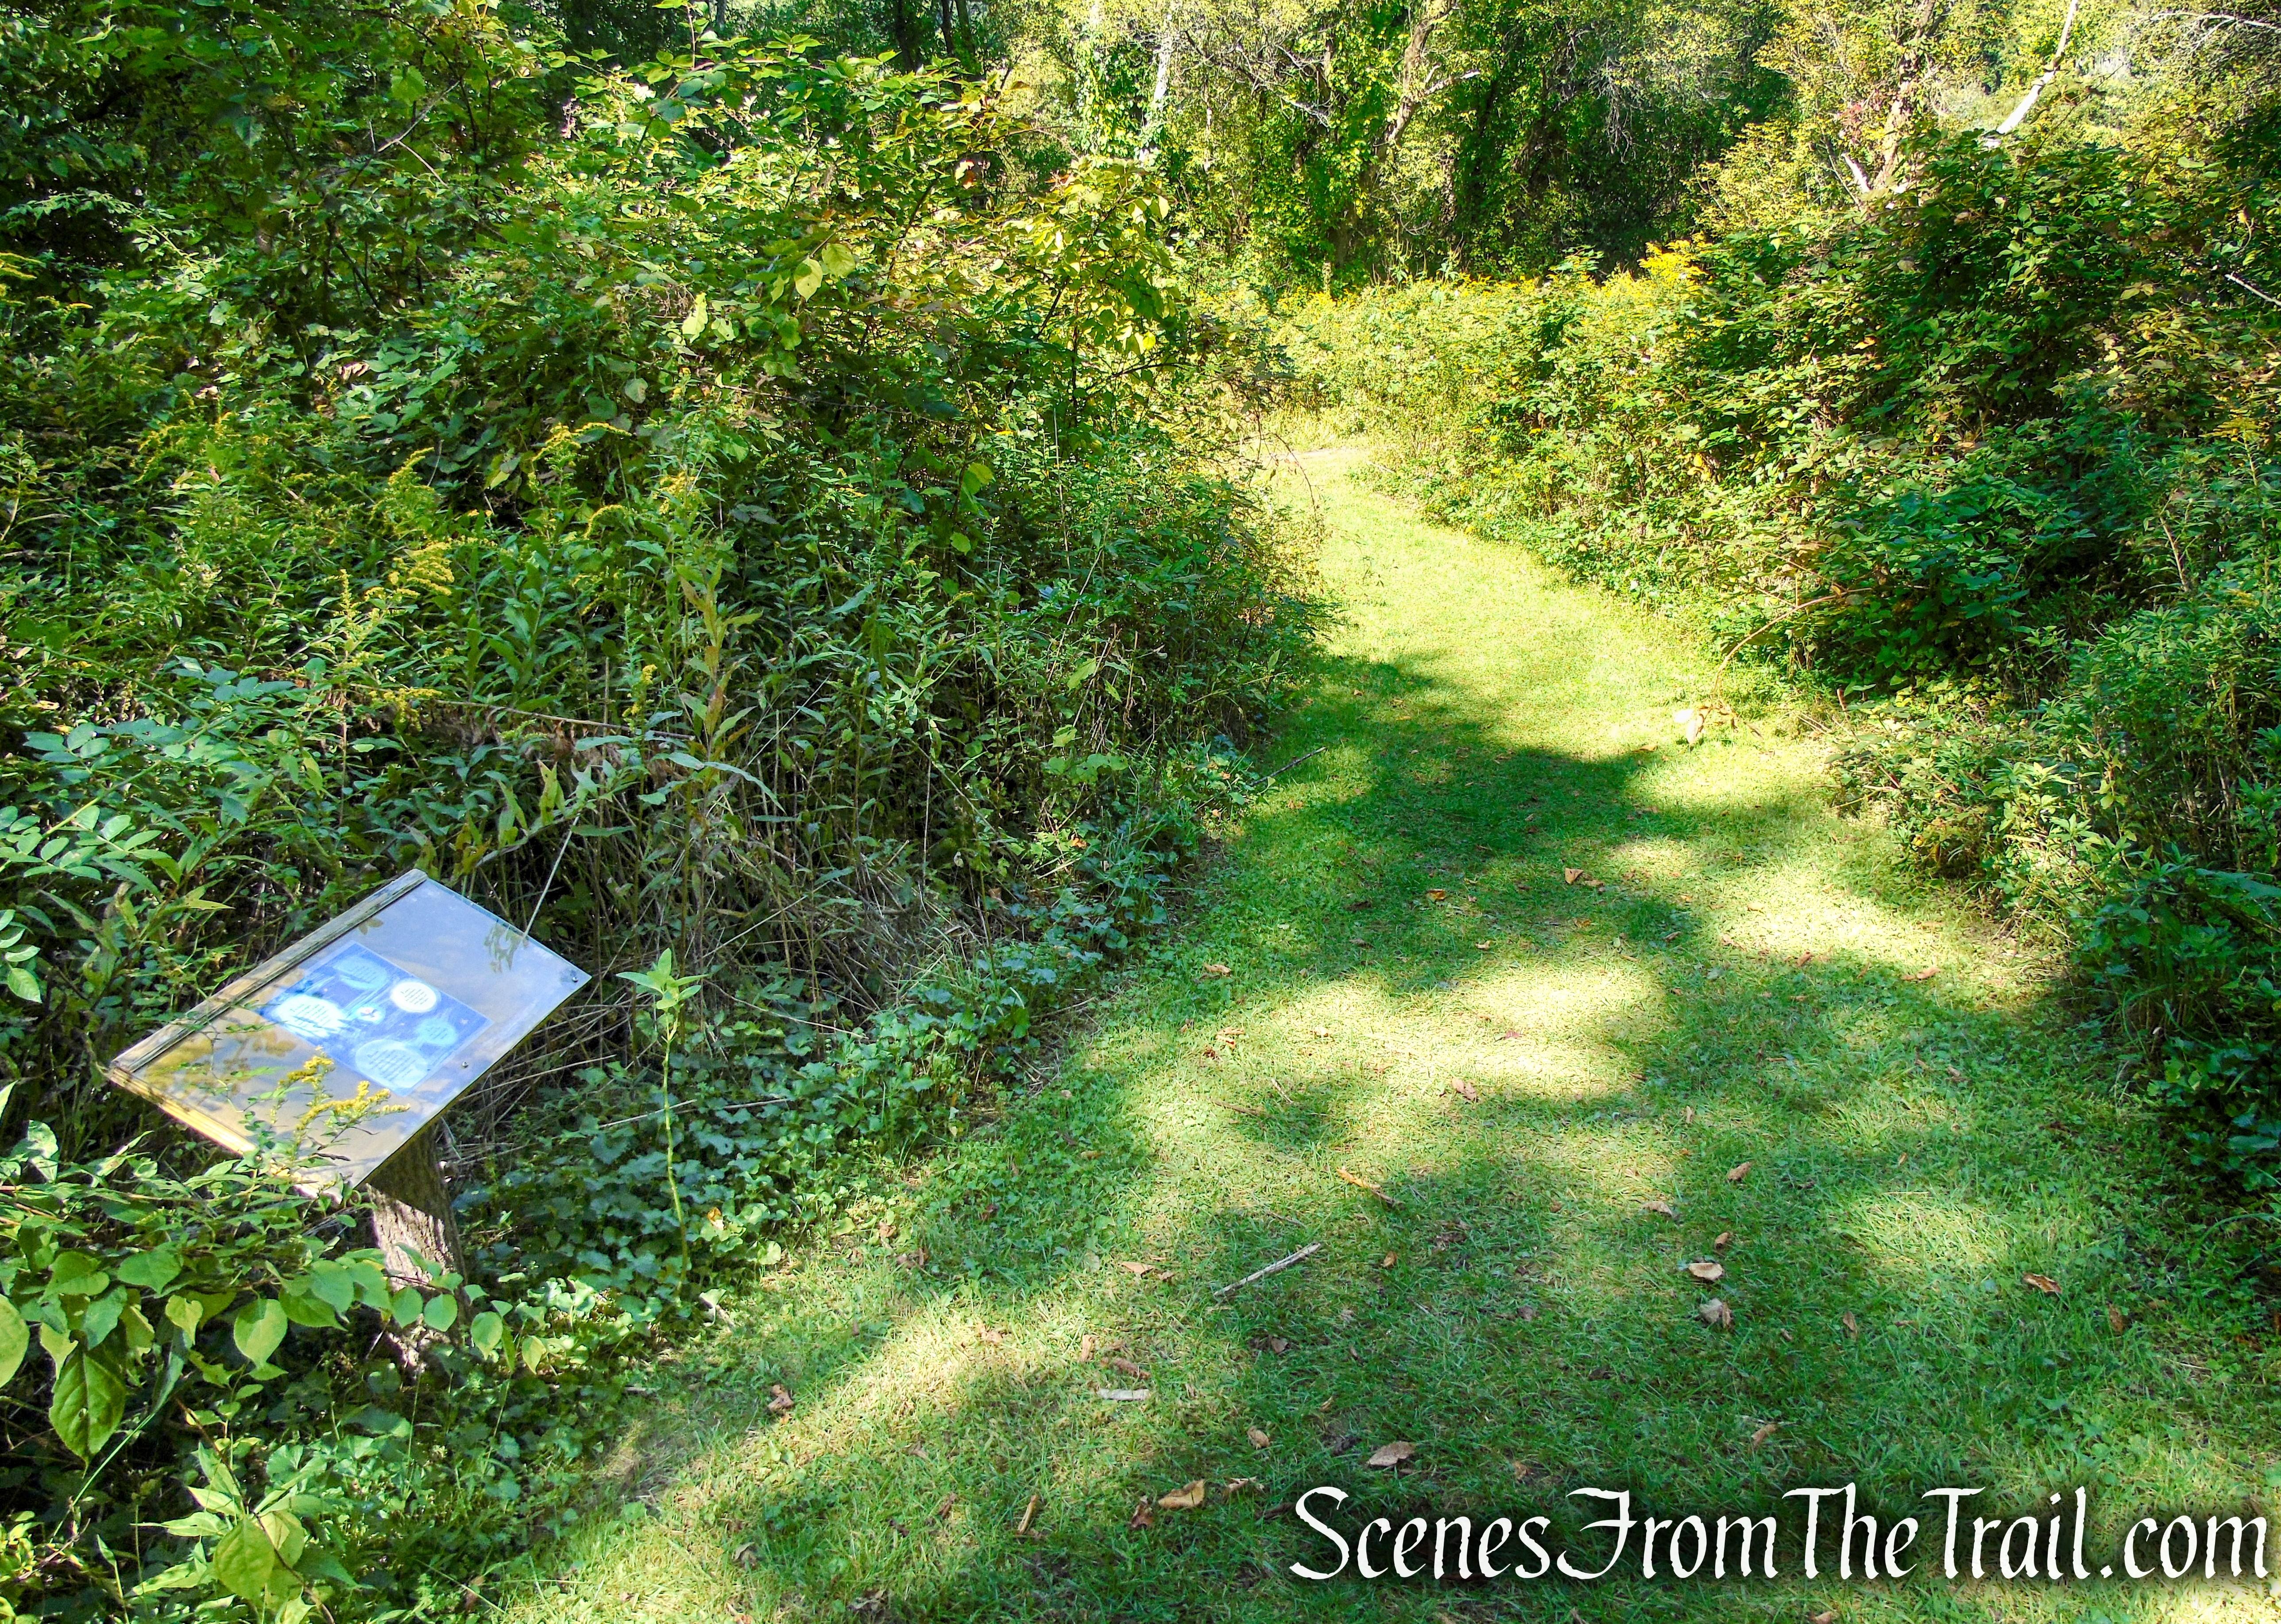 Story Walk Trail - Macricostas Preserve